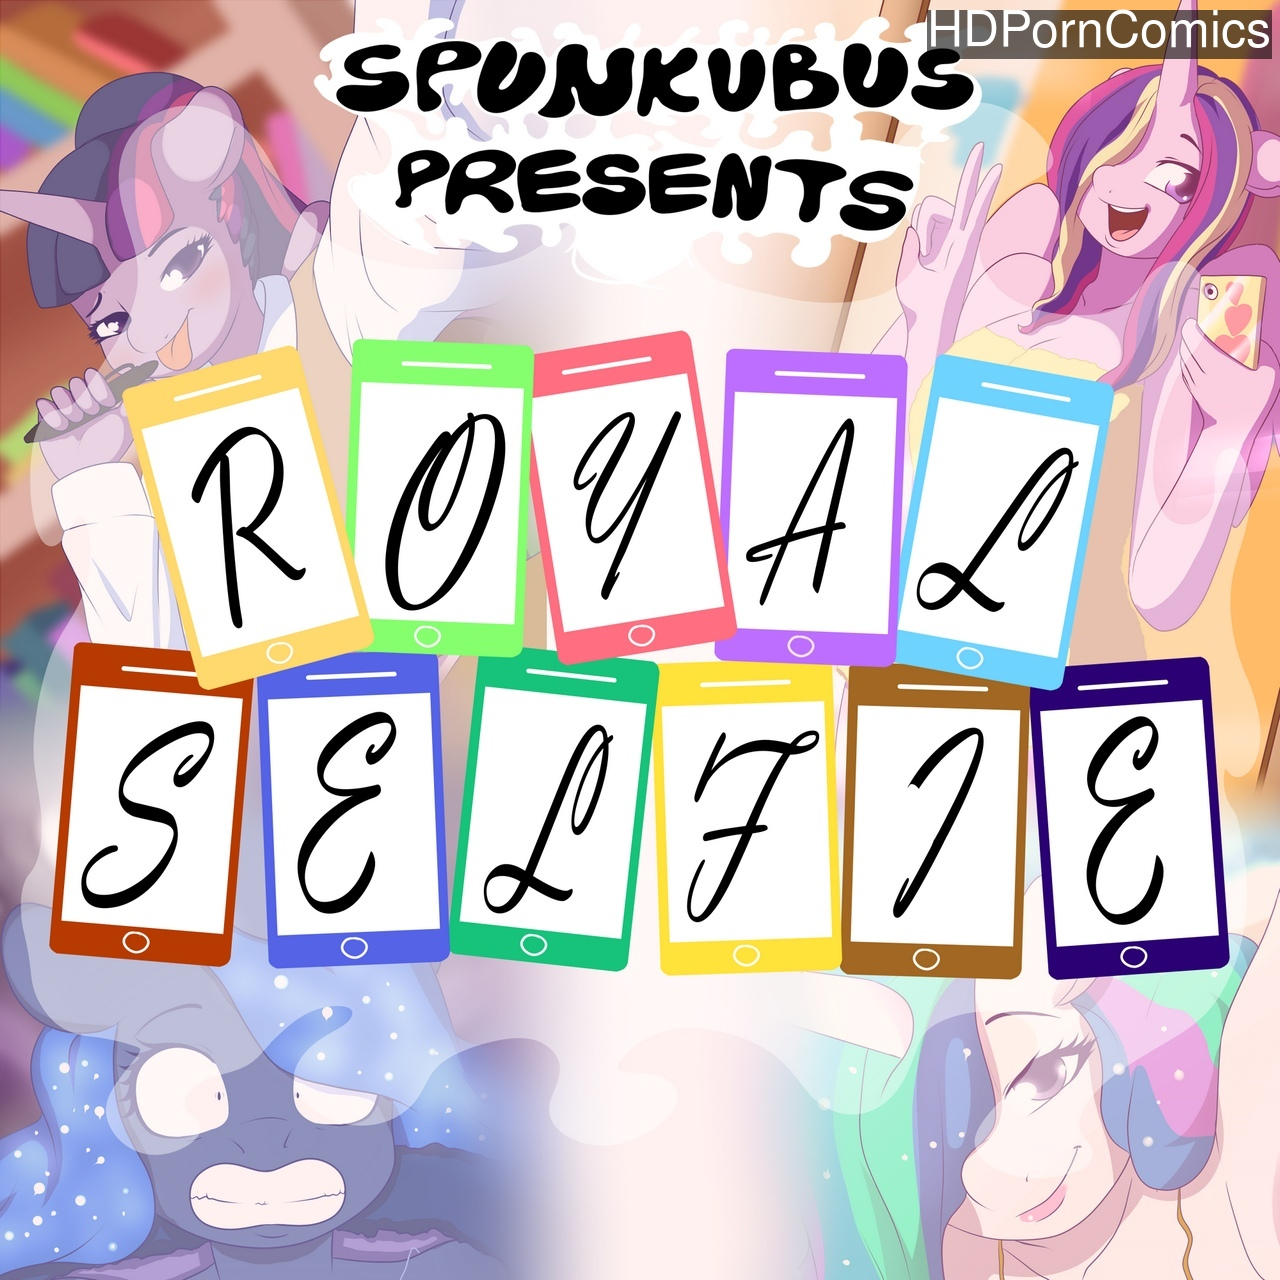 Royal-Selfie 1 free porn comics